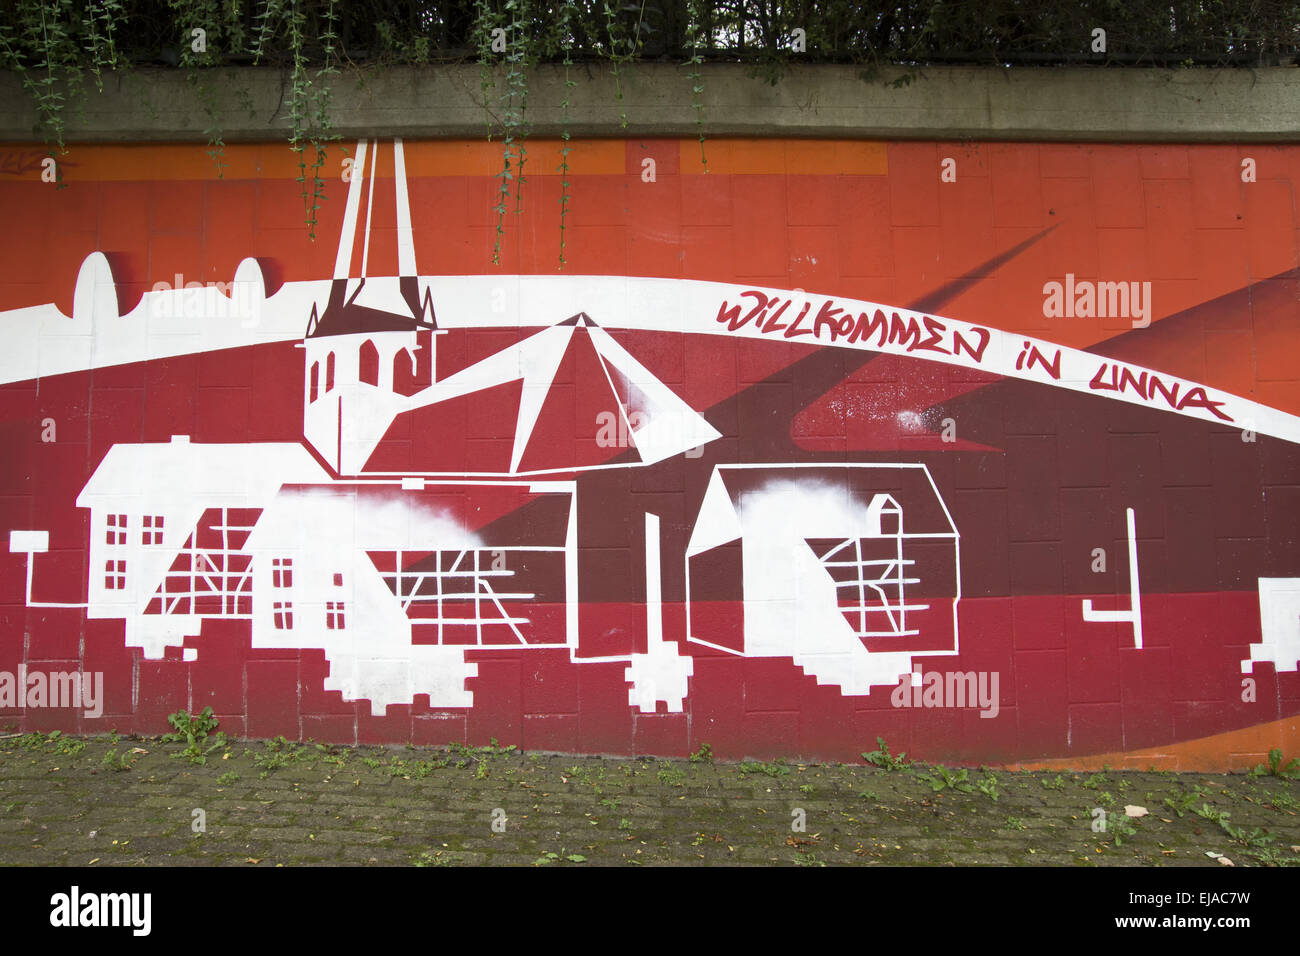 Graffiti Willkommen in Unna, Unna, Germany - Stock Image